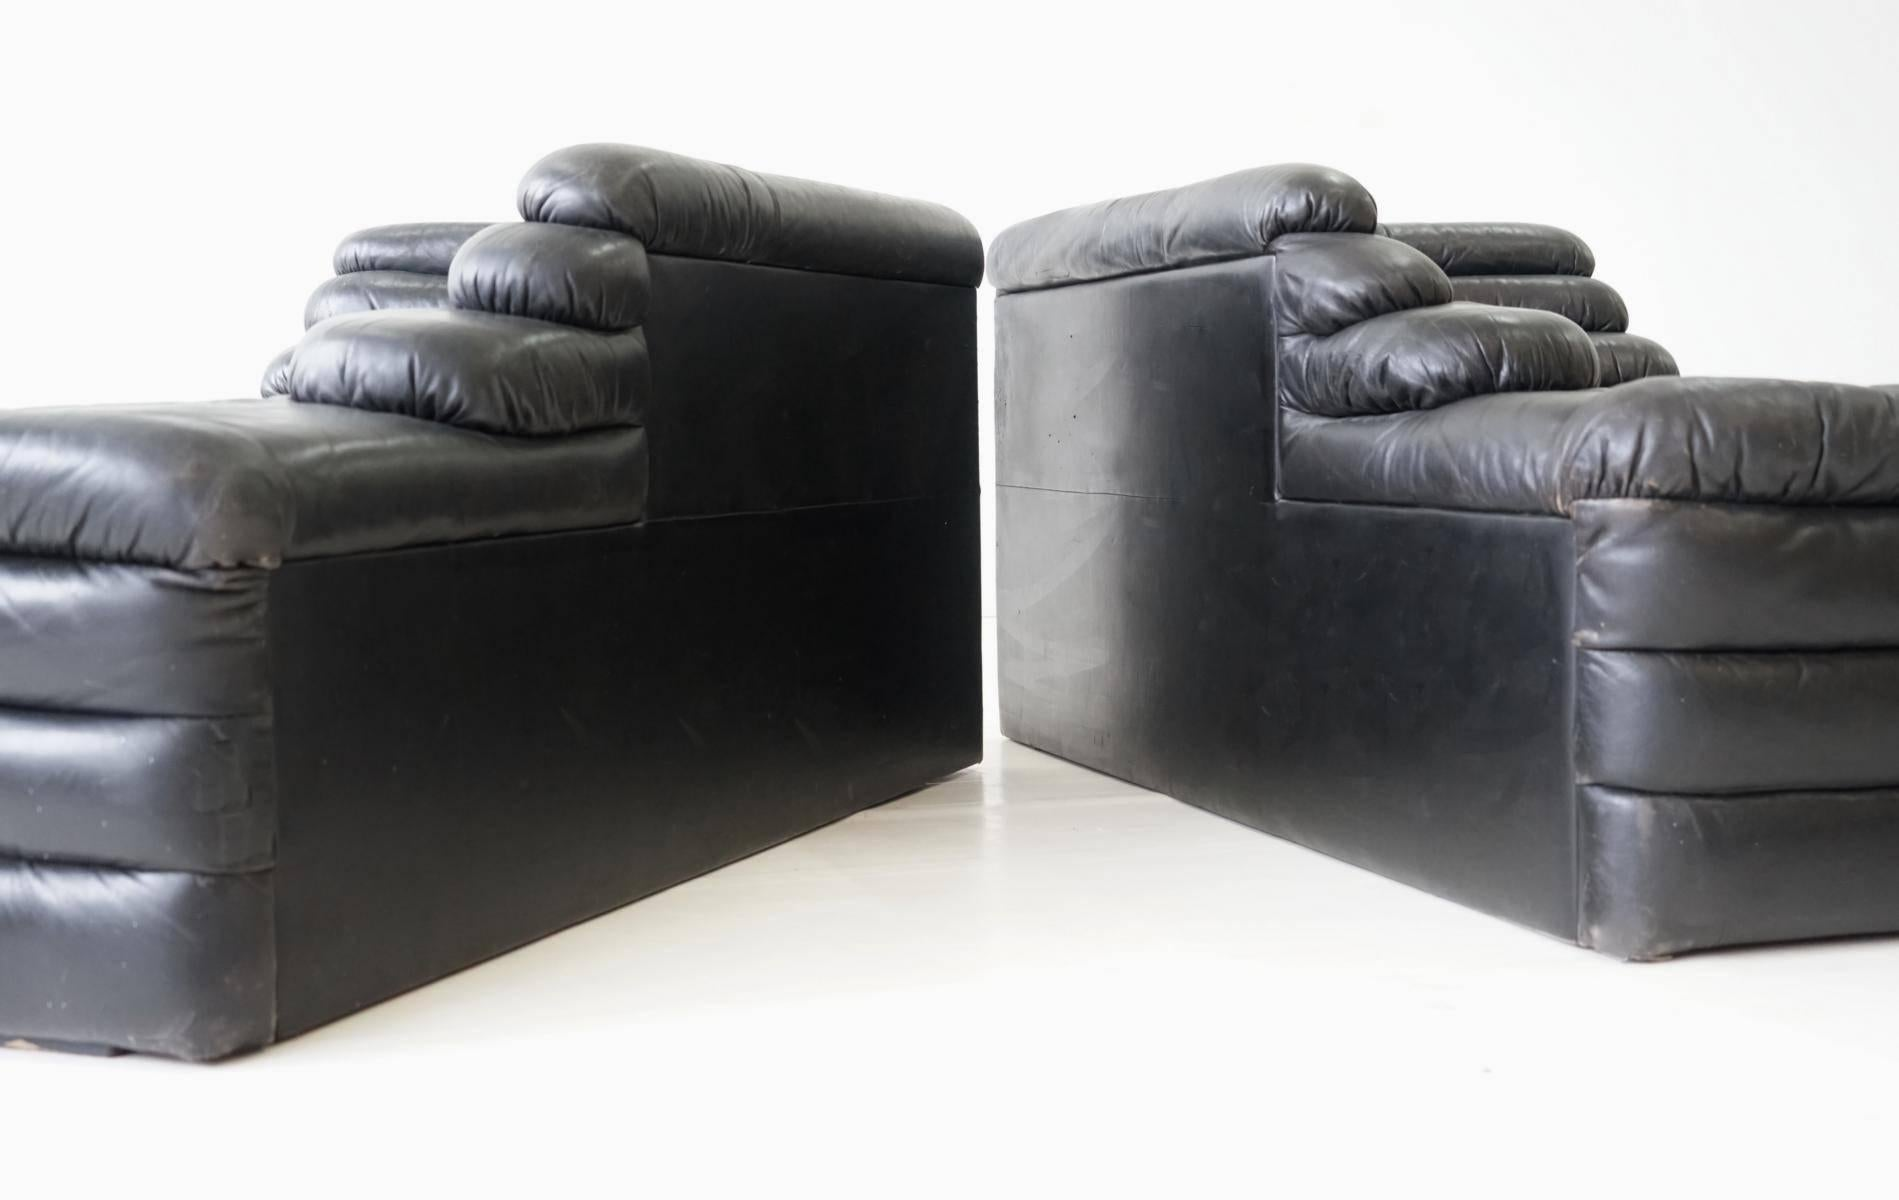 Beau Original Leather Pair Of DS 1025 Terrazza By Ubald Klug De Sede Lounge Sofa  Cana For